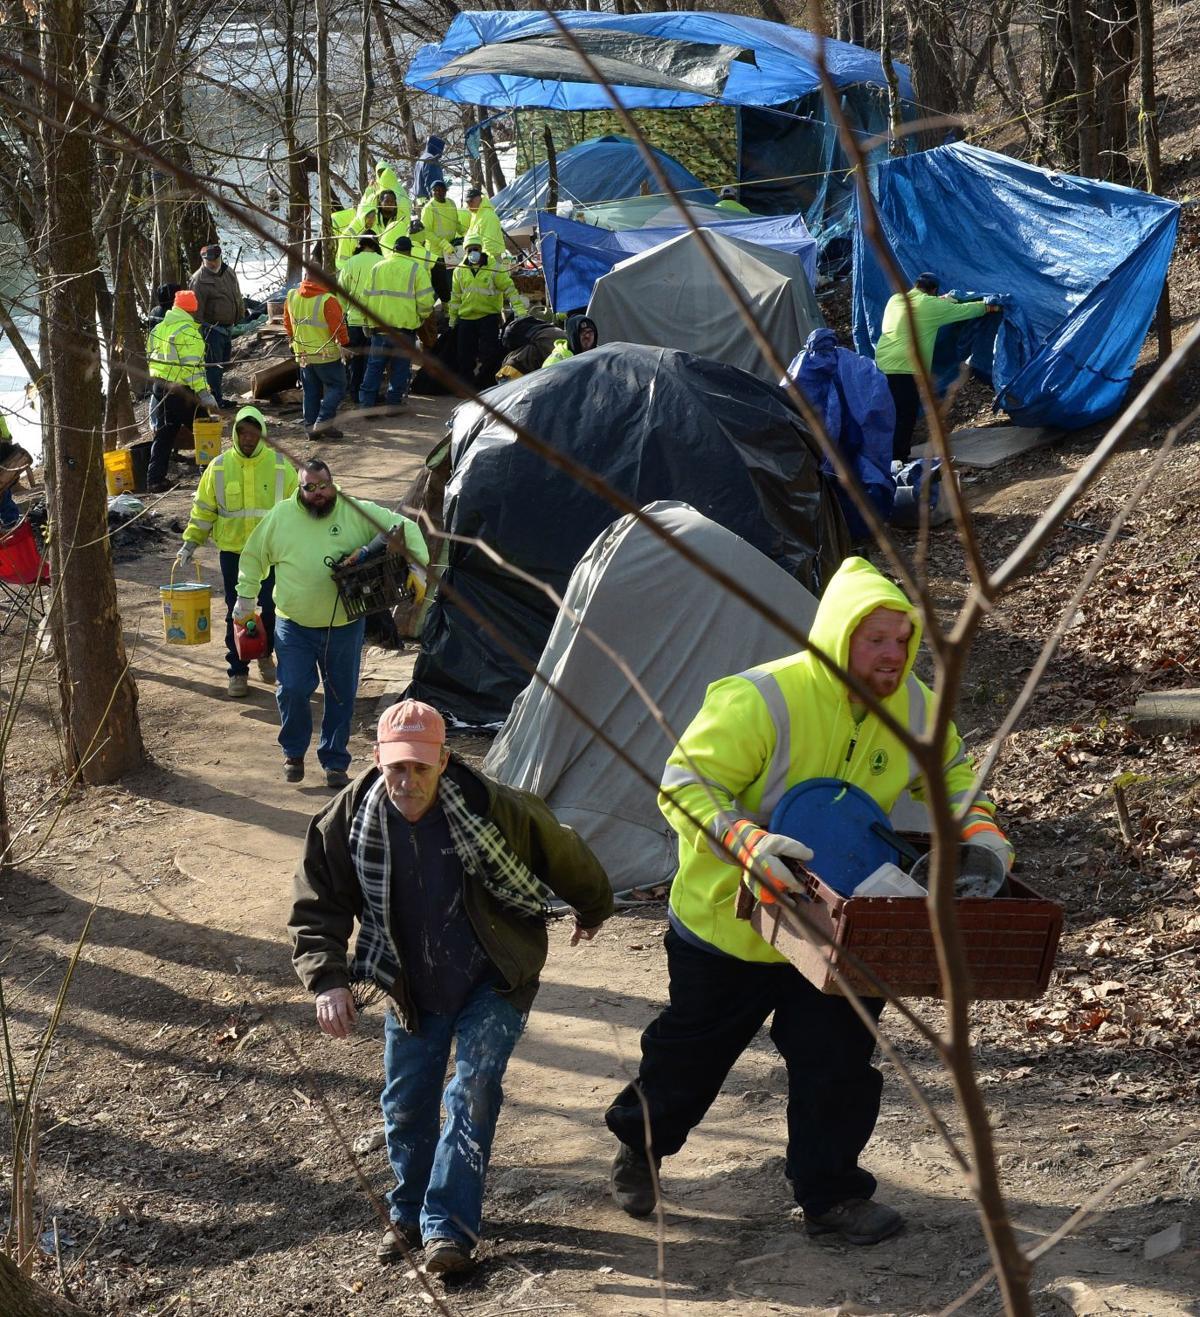 Charleston Mayor Orders 'Tent City' Dismantled